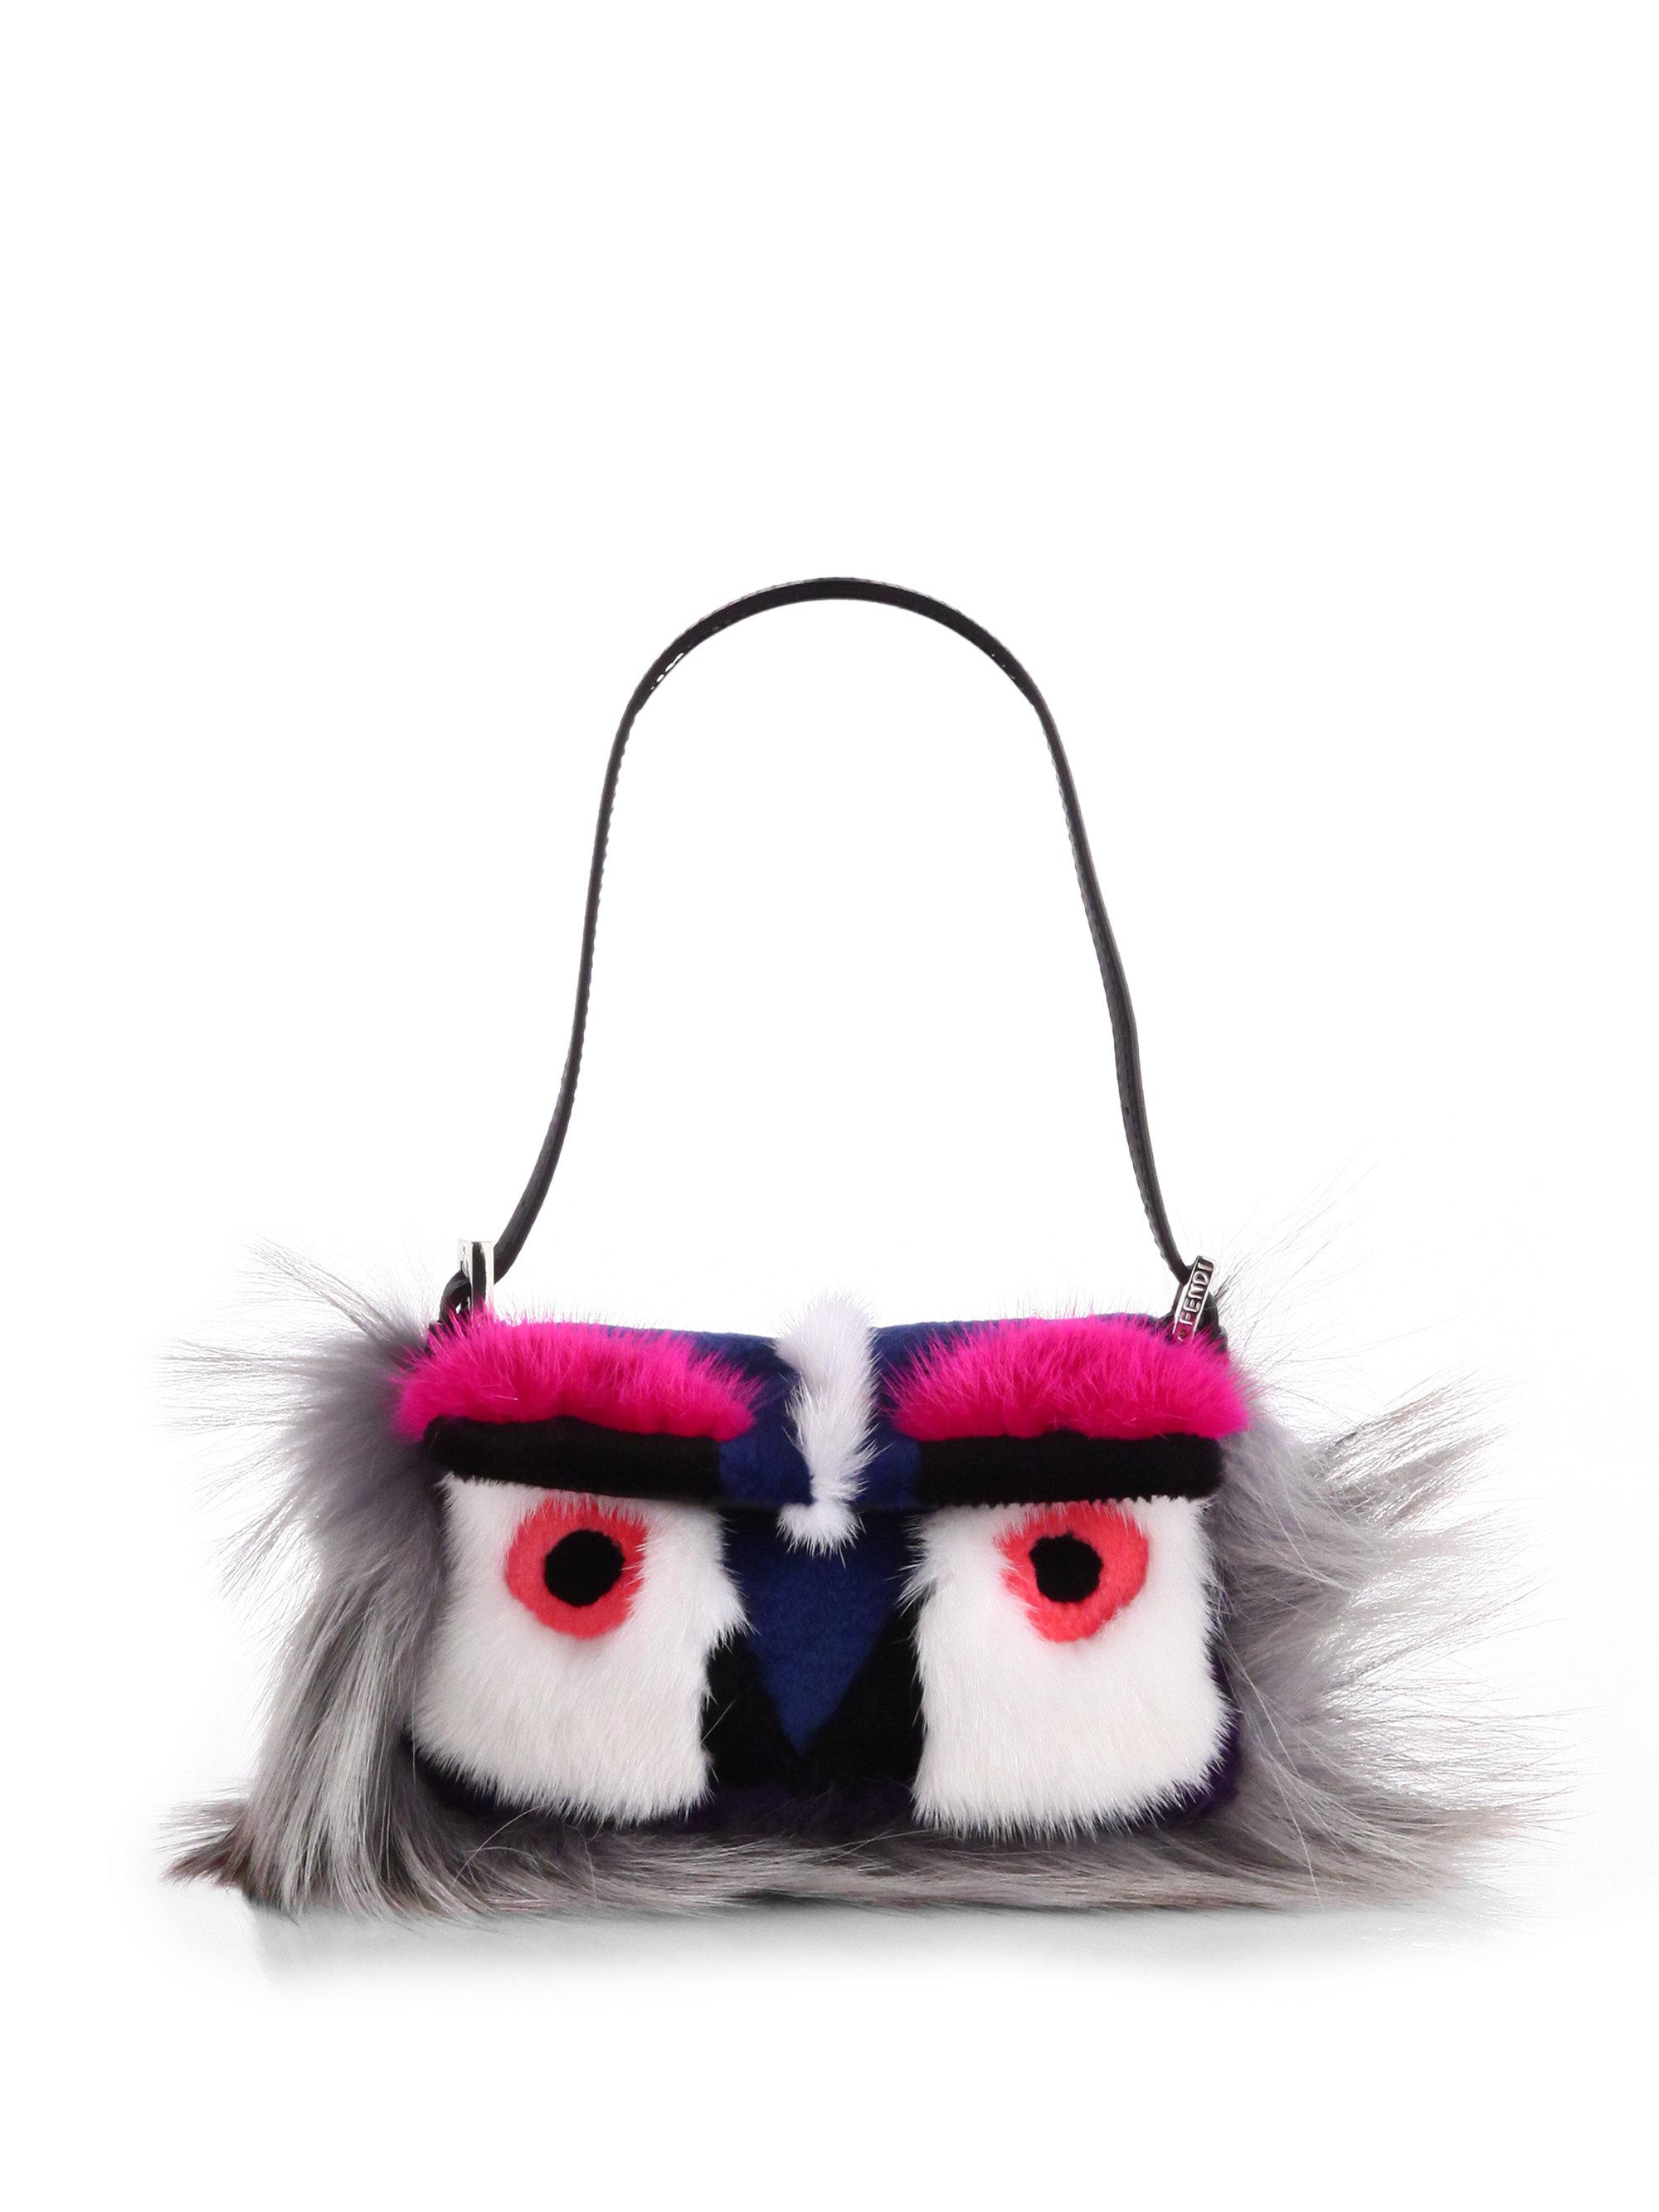 order fendi peekaboo large leather satchel bag b4edf b9bea  real lyst fendi  mixed fur mini bird baguette d1db5 7e2c8 10d47e16472ef